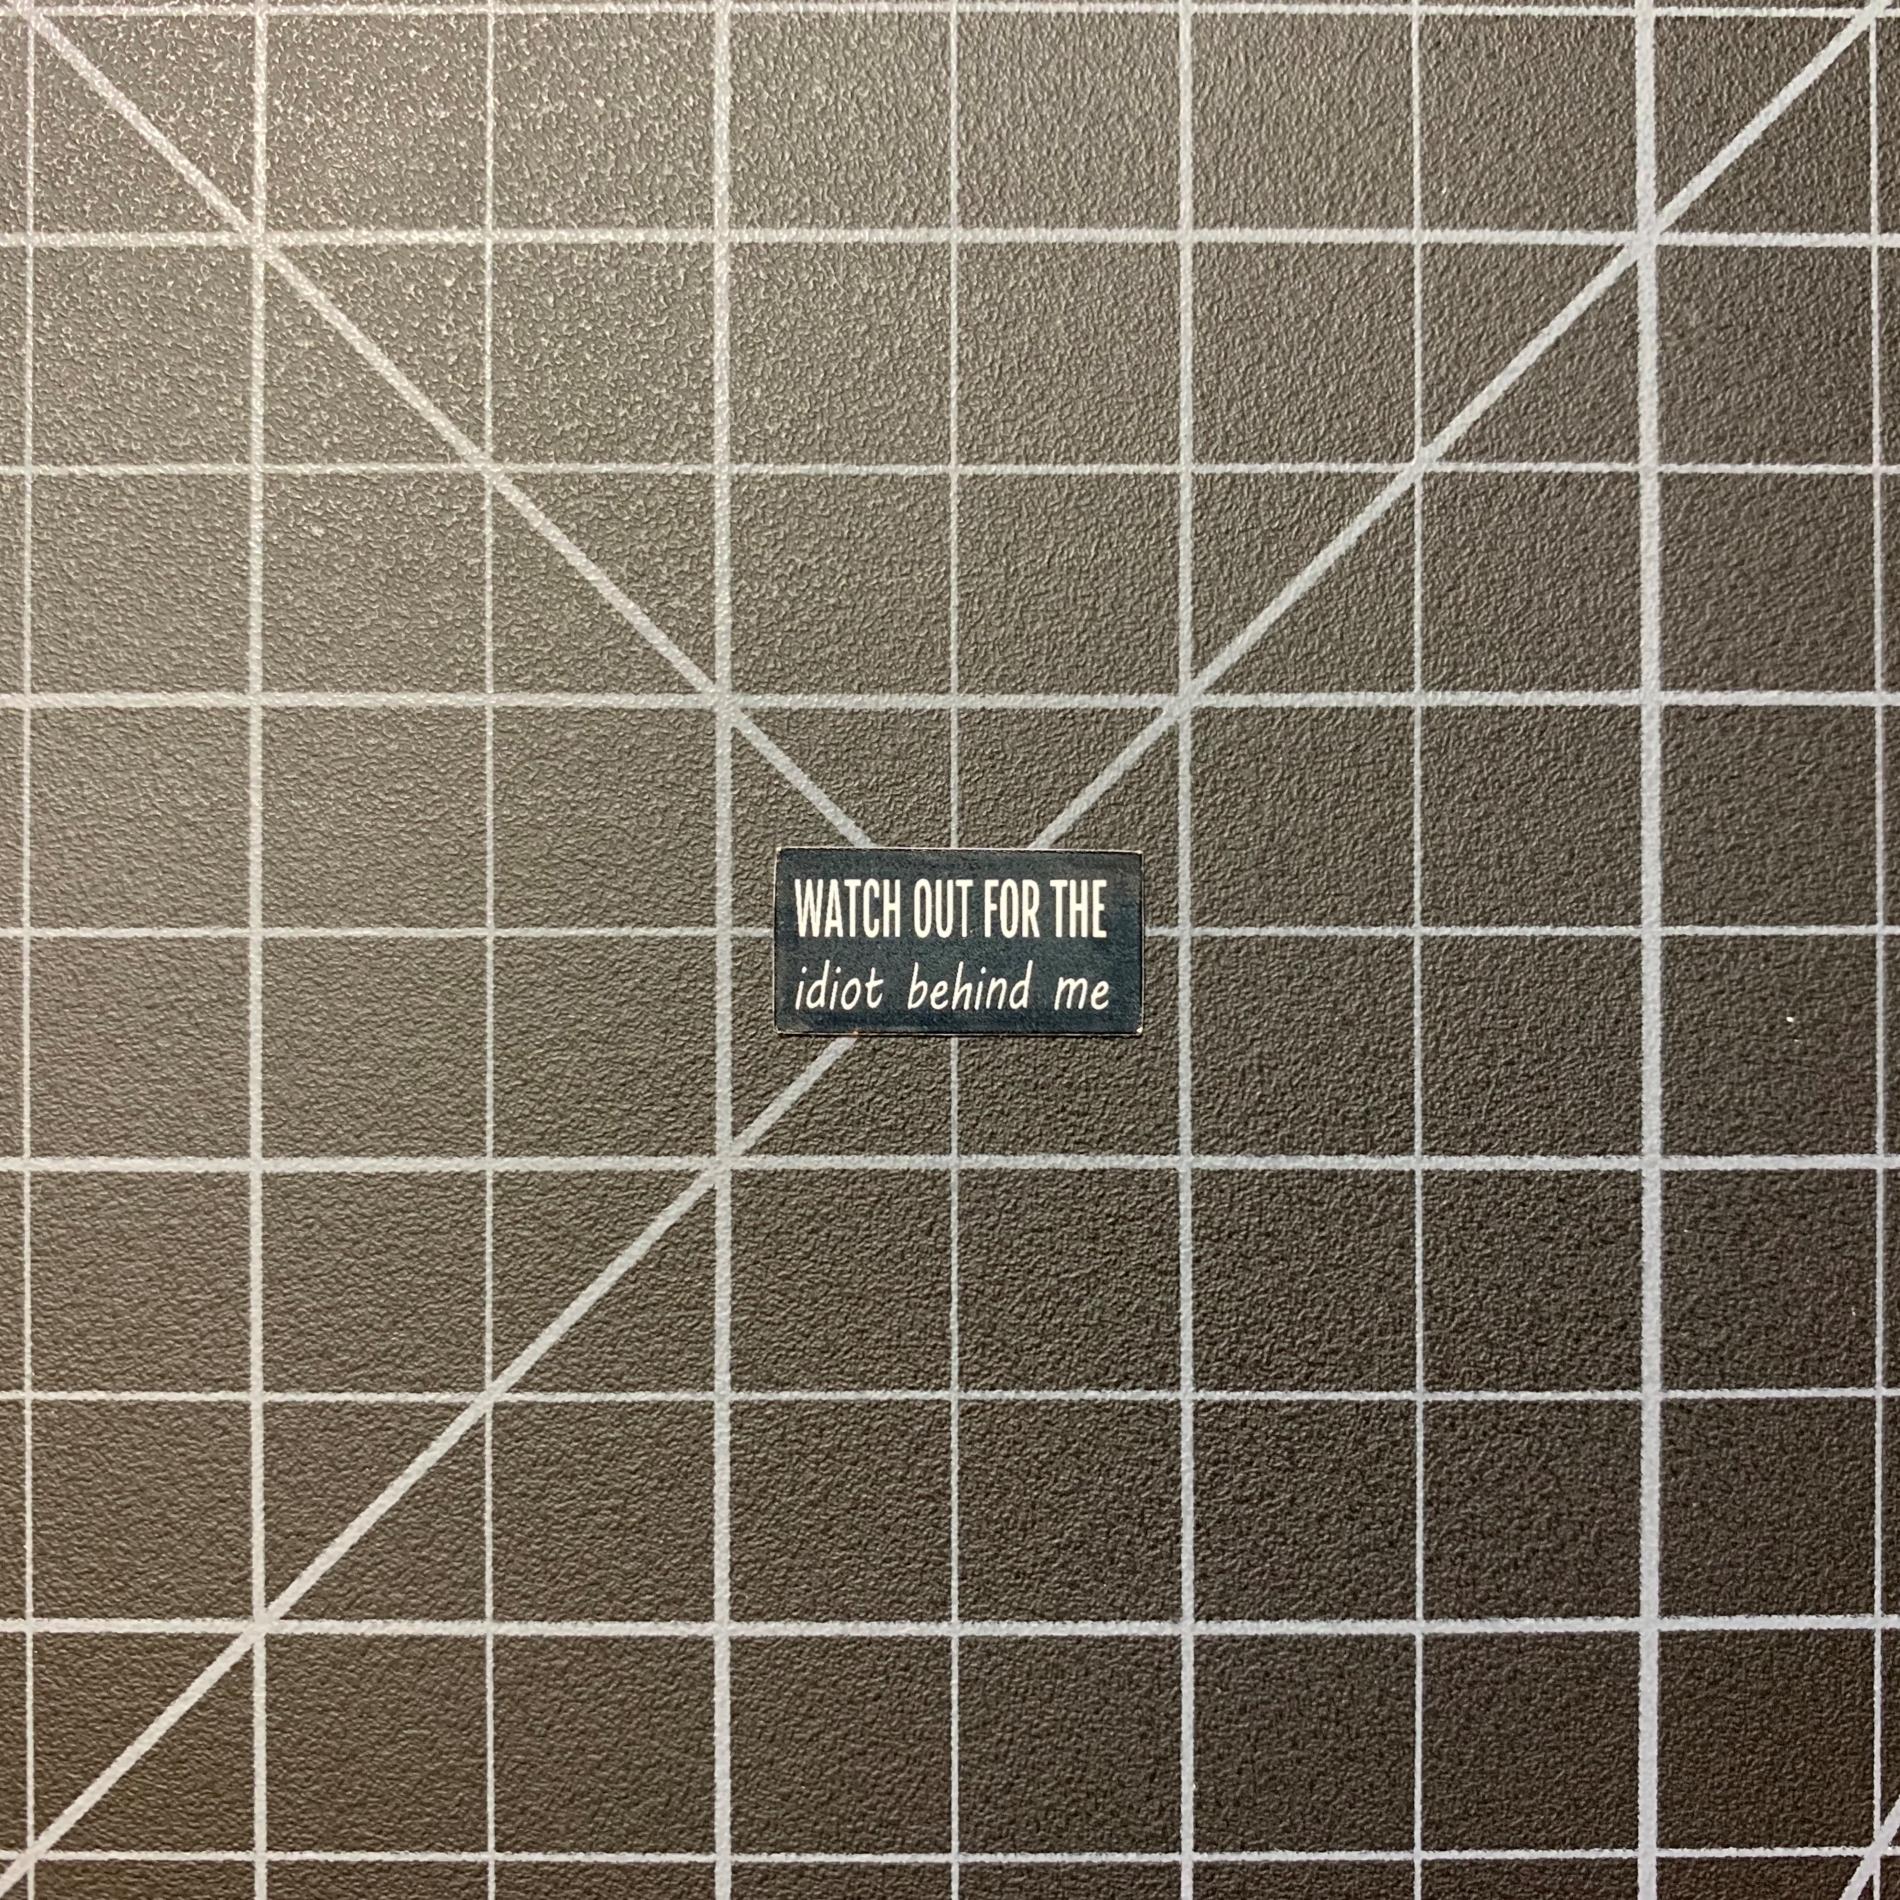 RC Bumper Stickers - Custom RC Stickers